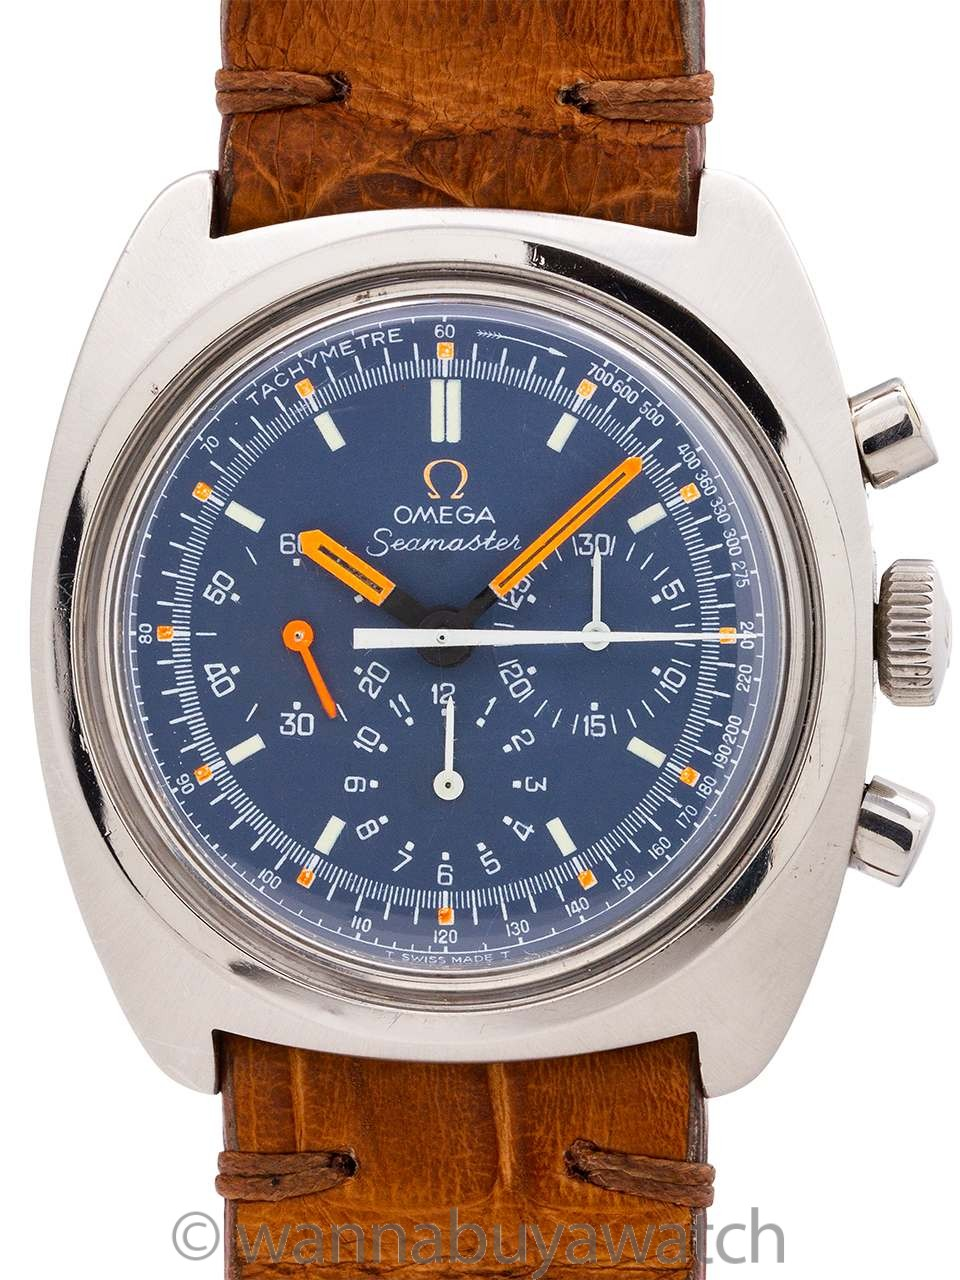 Omega Seamaster Chronograph Ref 145 029 Circa 1970